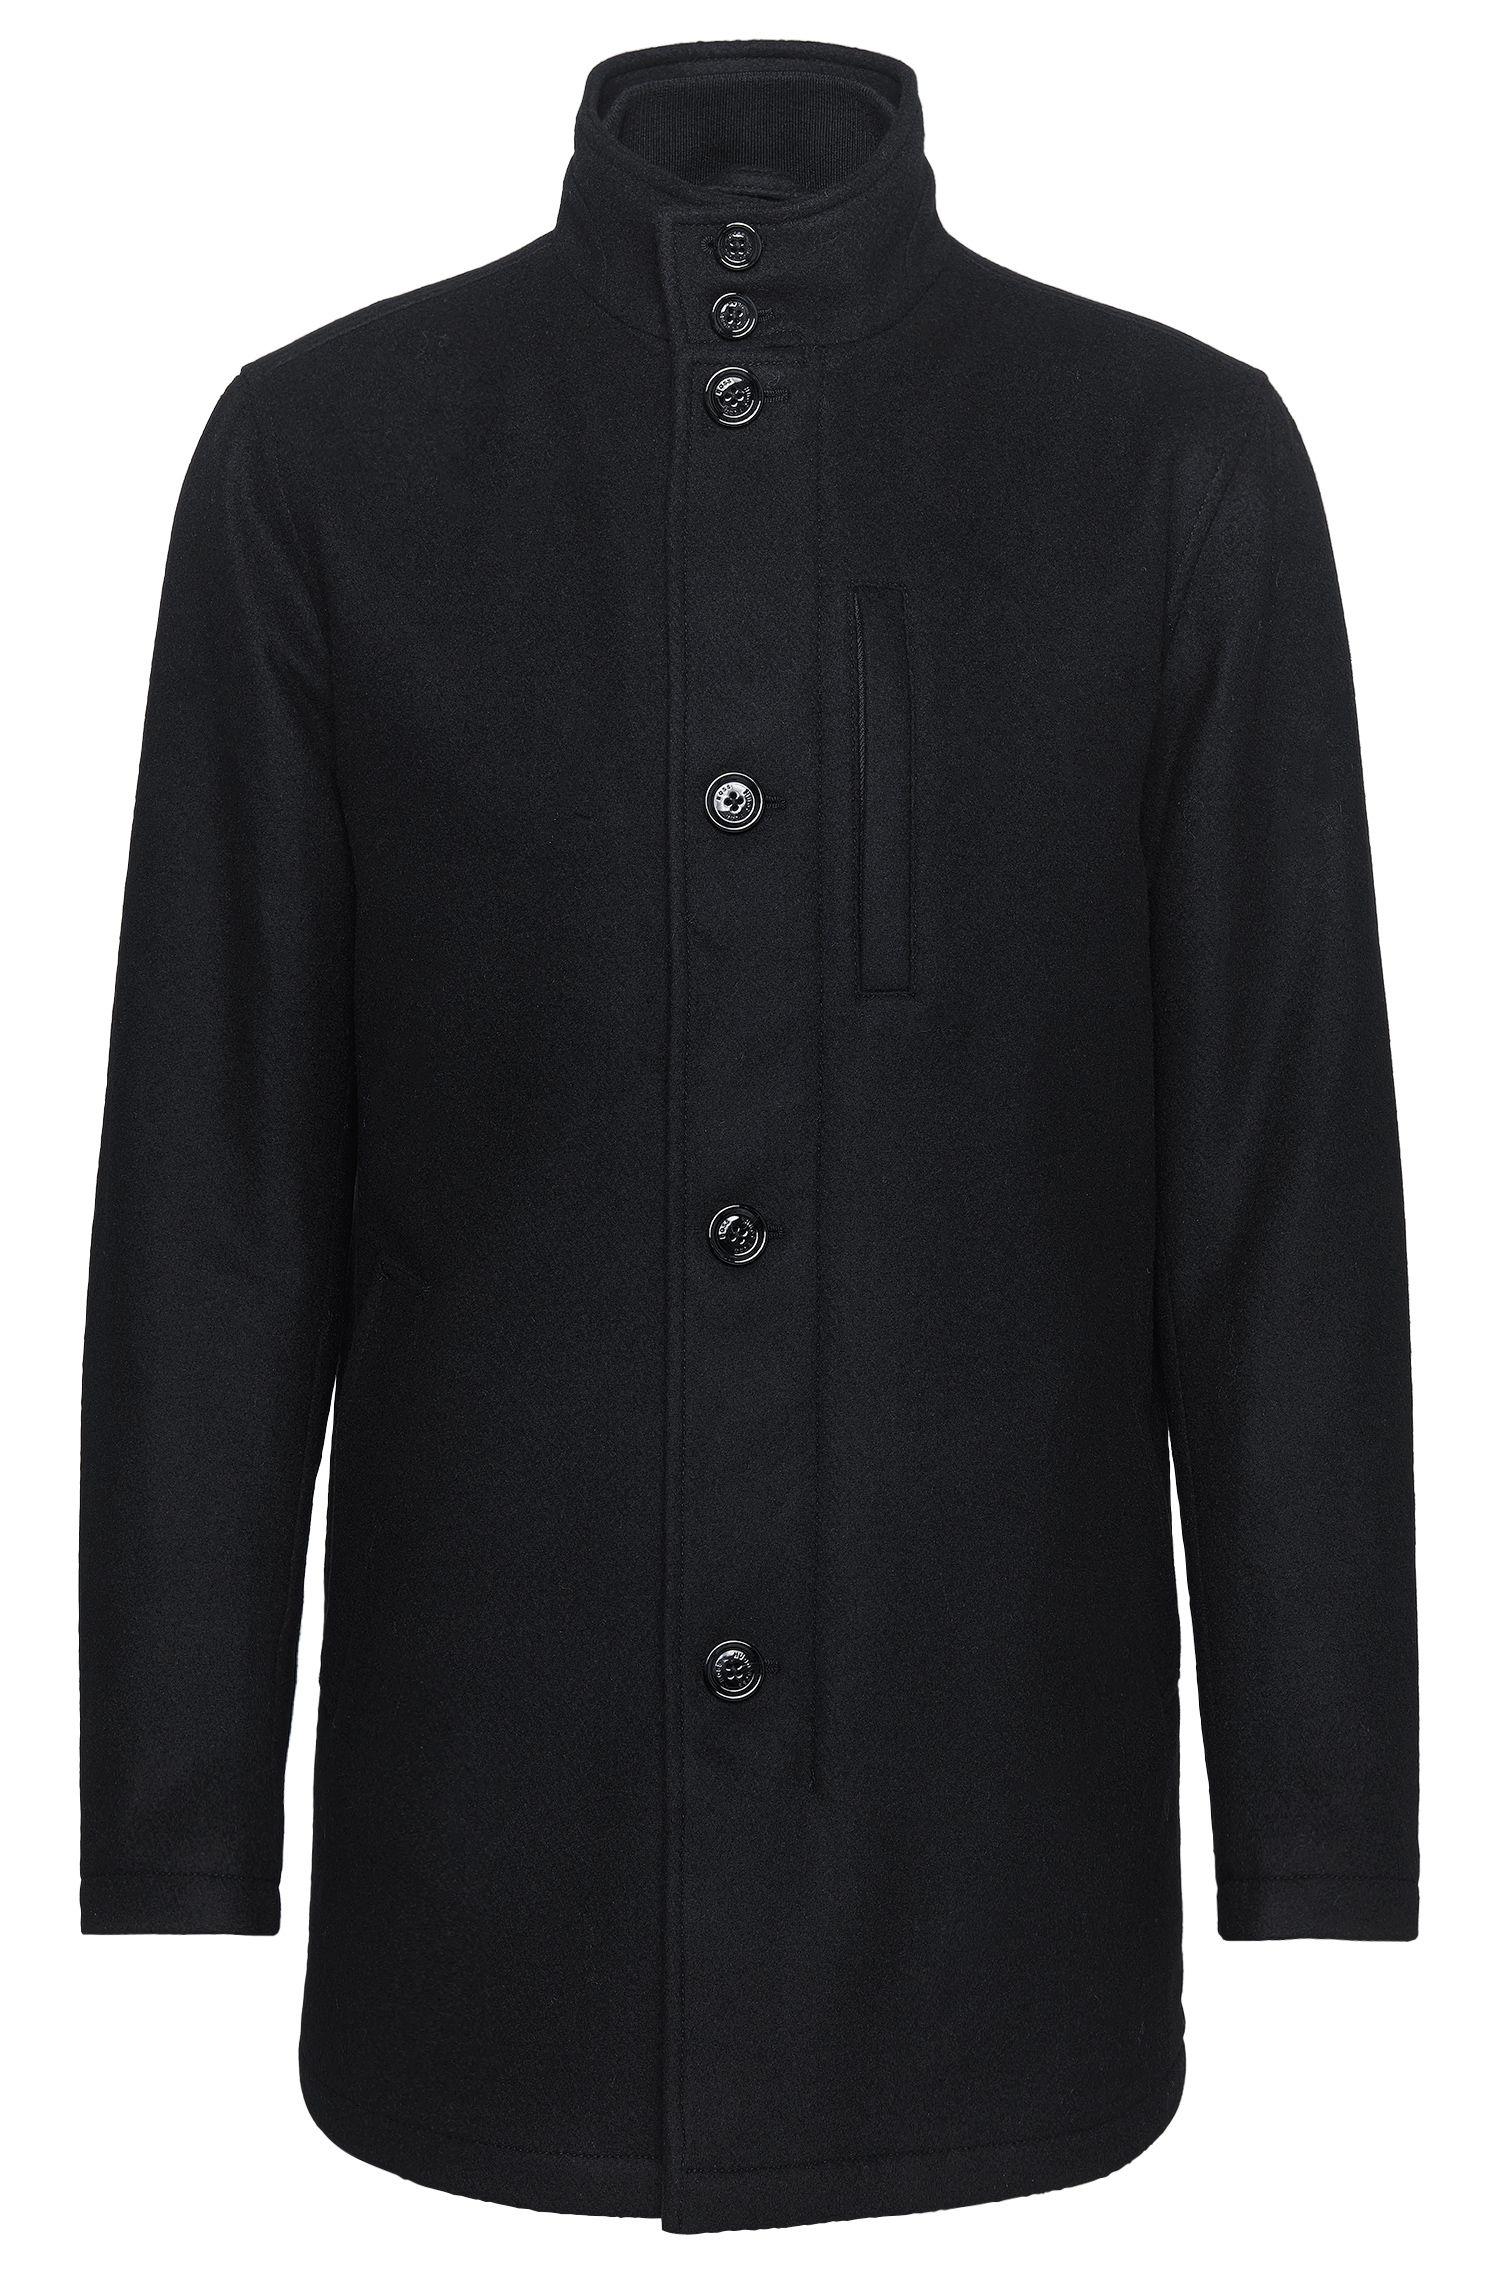 Wool Blend Jacket   Camron, Black